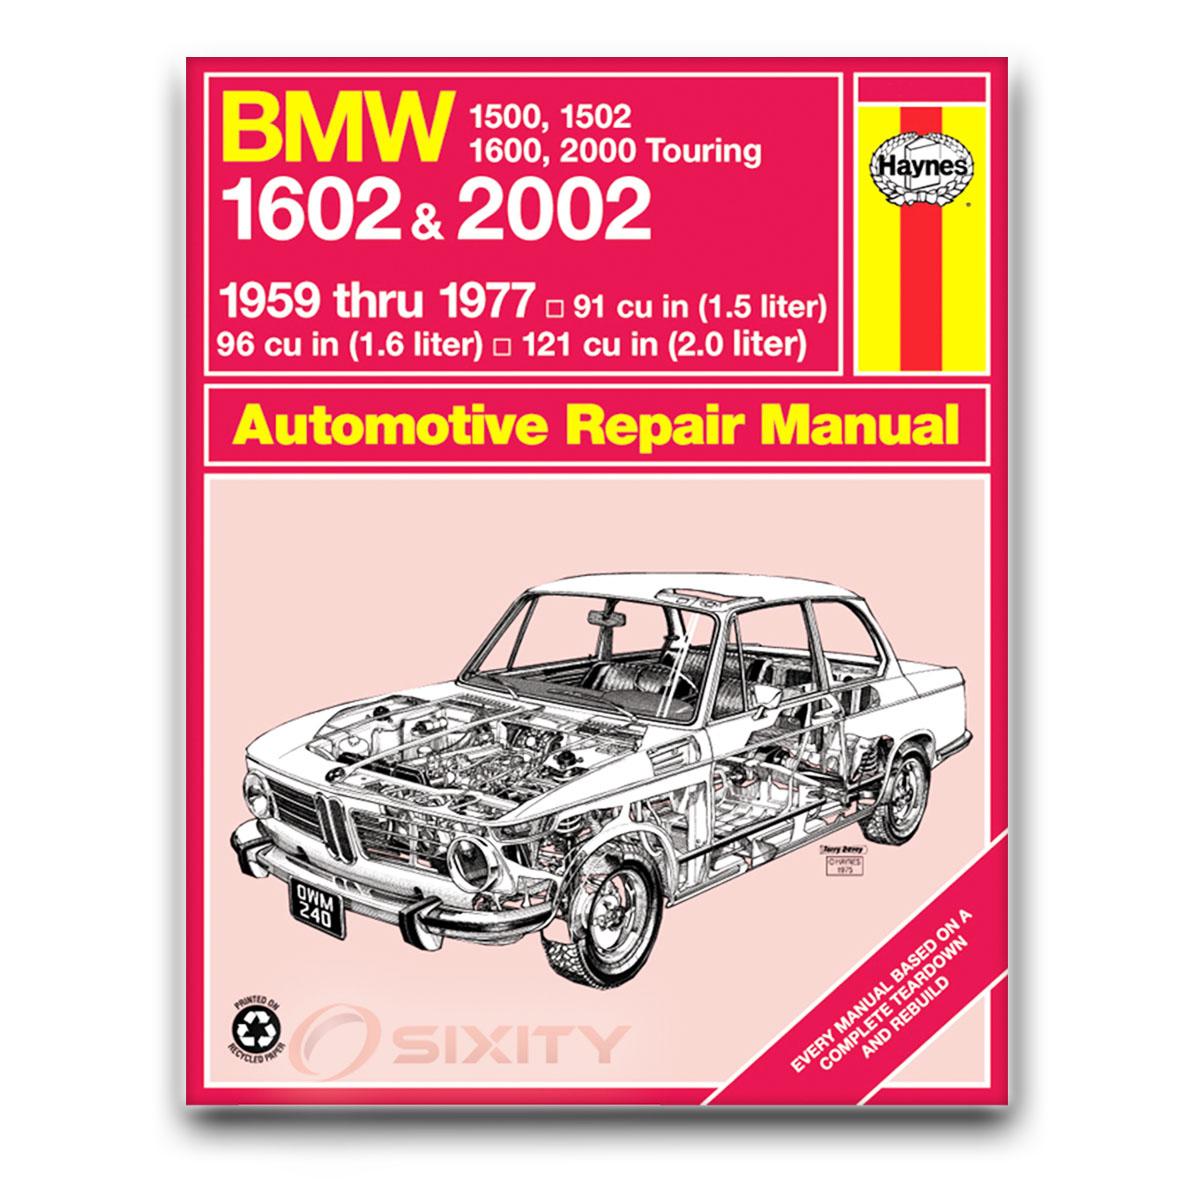 bmw 2002 haynes repair manual cabriolet base turbo shop service rh ebay com bmw 2002 repair manual free download bmw 2002 haynes manual